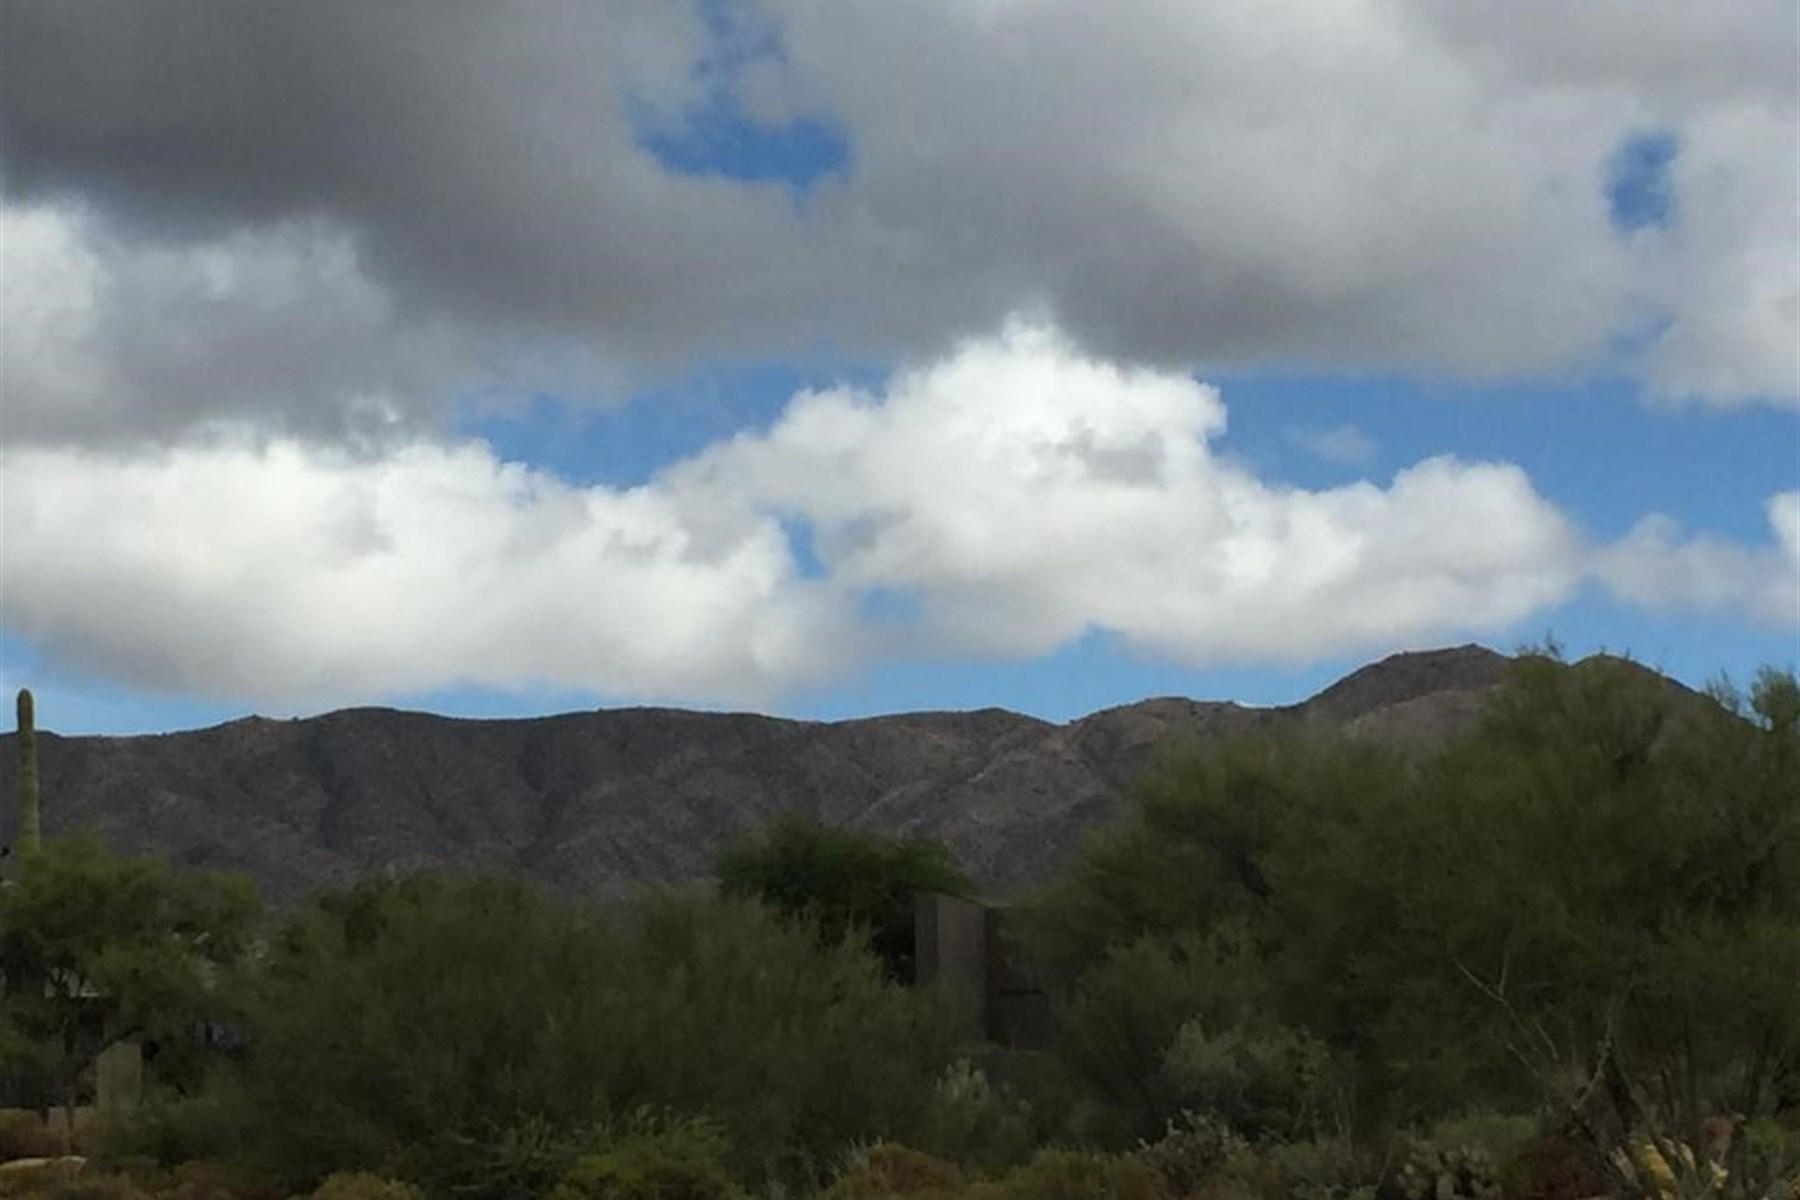 Terreno por un Venta en Centrally located village of Mountain Skyline at Desert Mountain 39870 N 98th Way #44 Scottsdale, Arizona, 85262 Estados Unidos